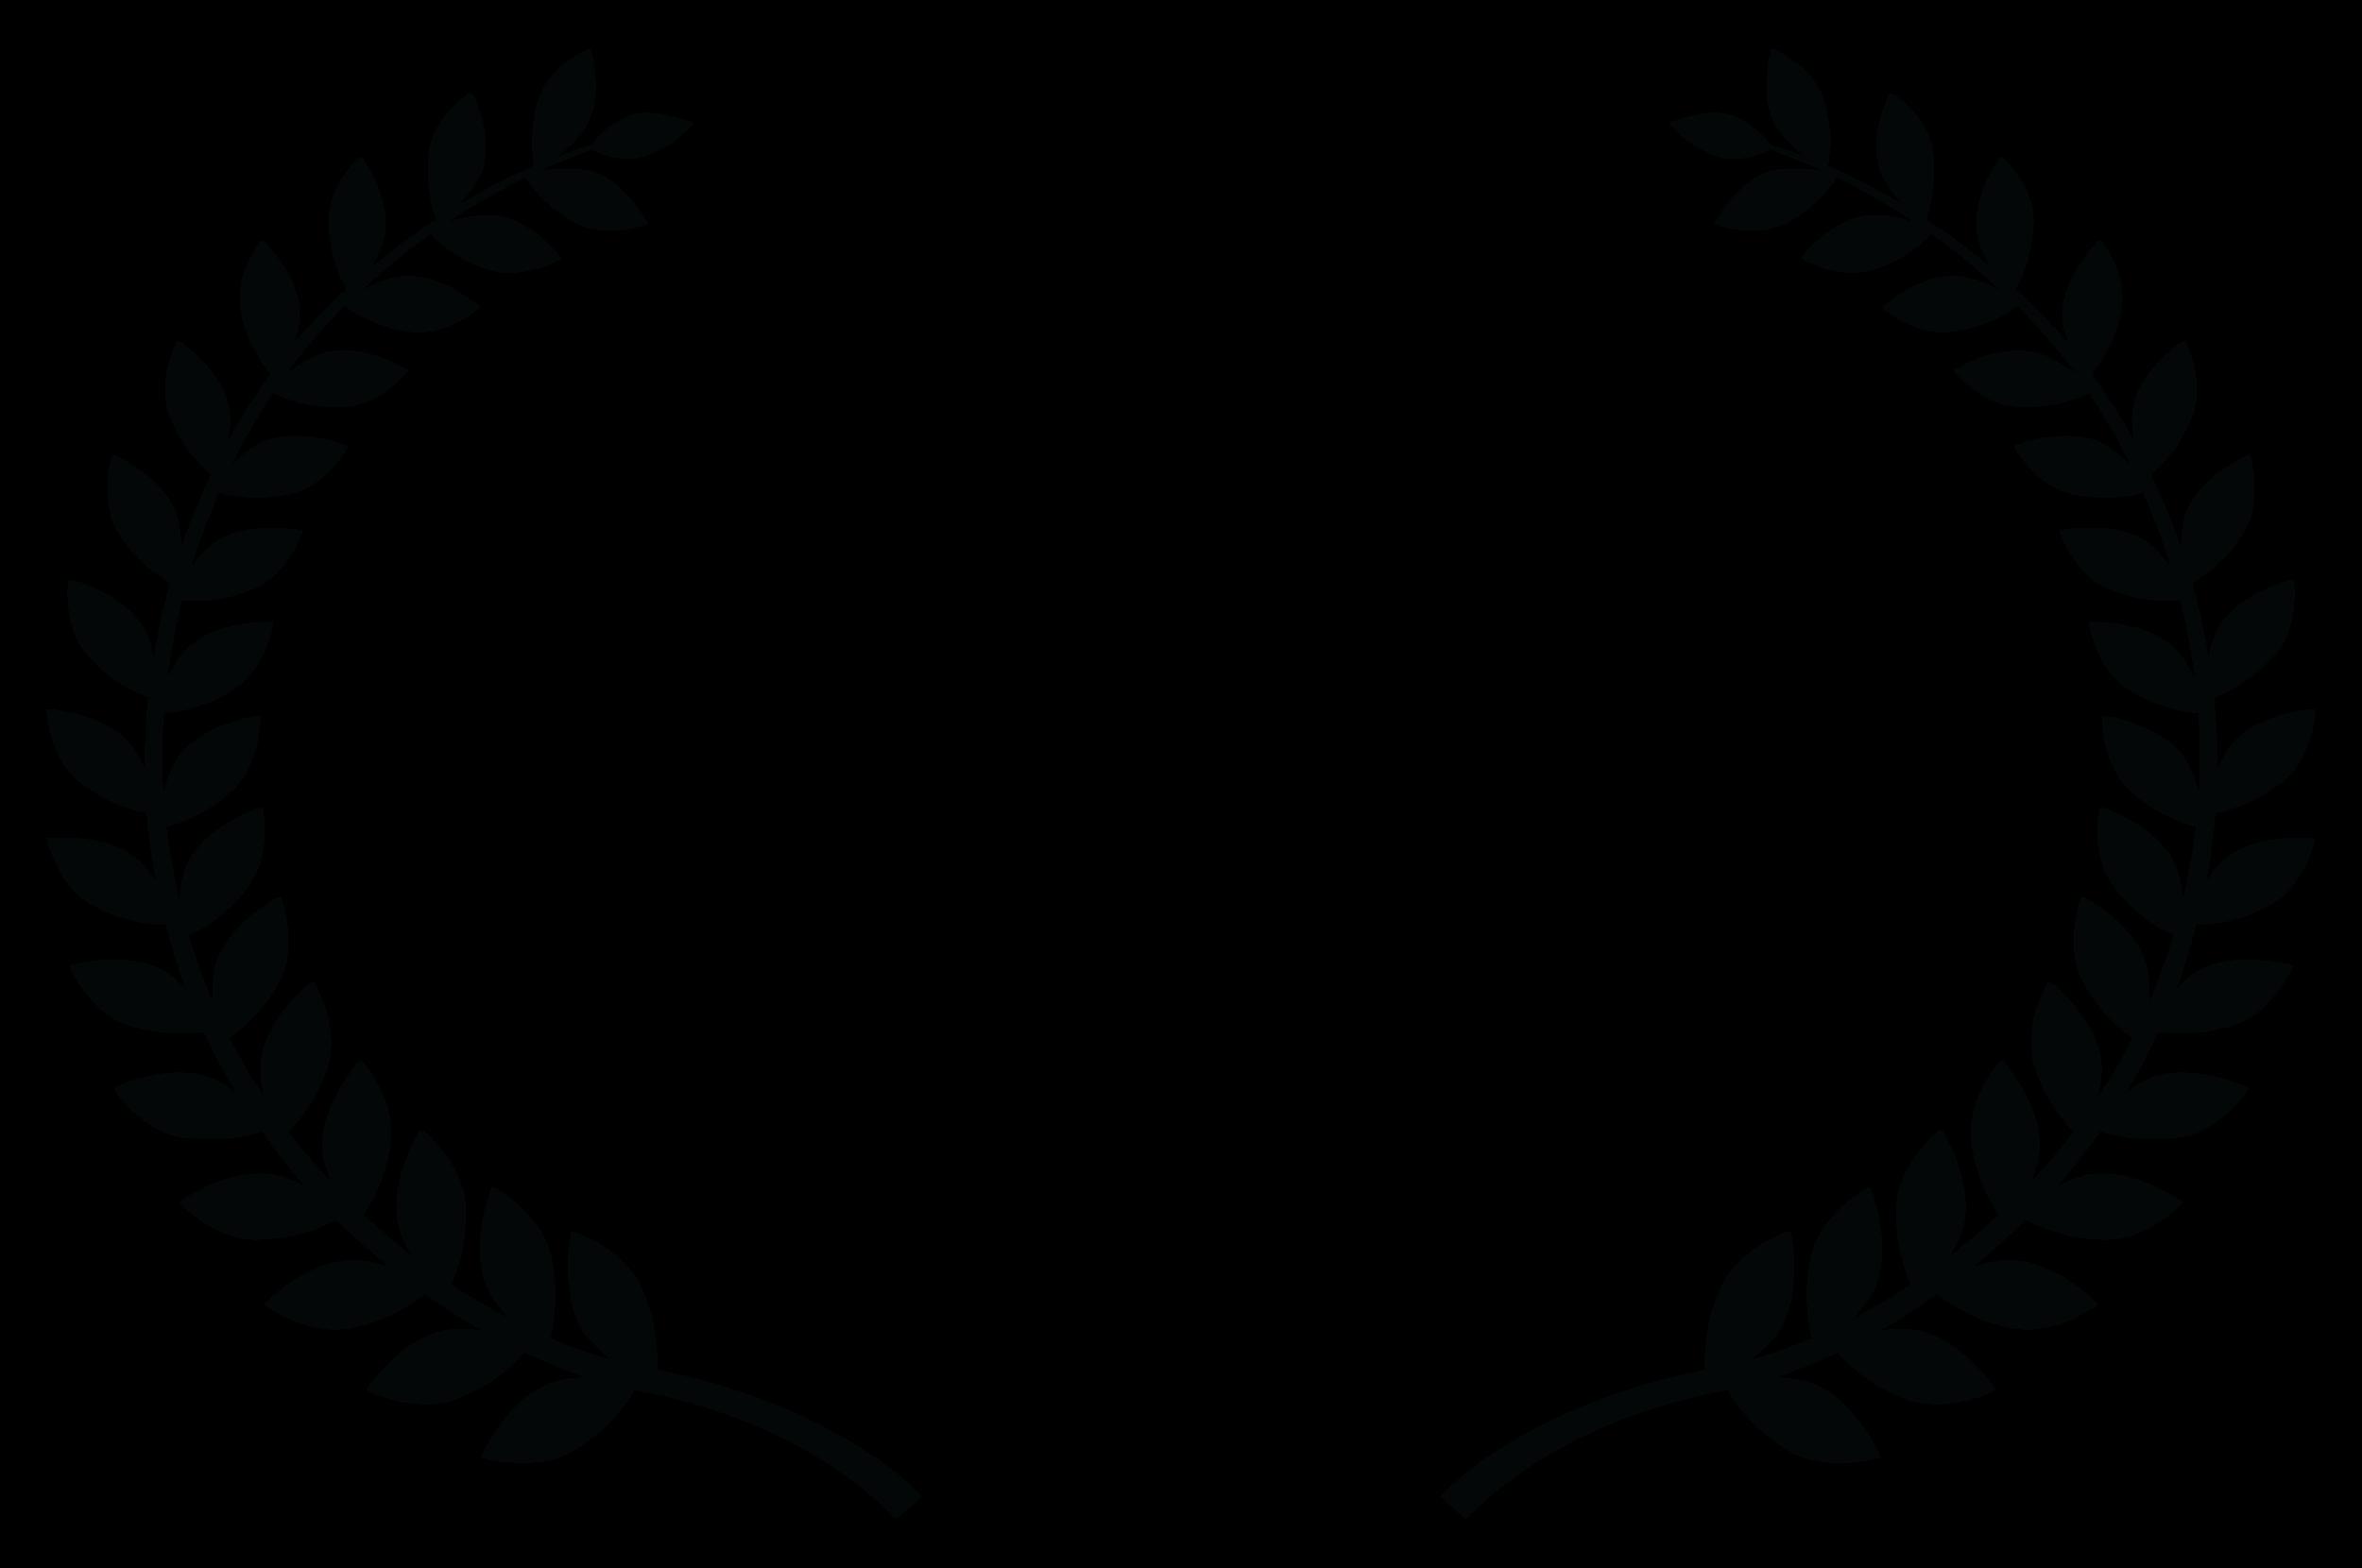 OFFICIALSELECTION-RICHMONDINTERNATIONALFILMFESTIVAL-2018.png